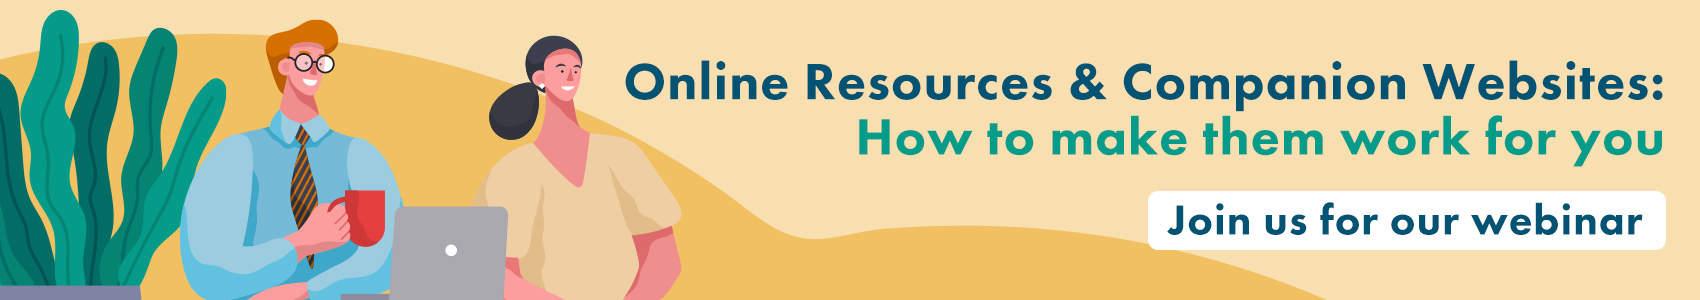 Online Resources Webinar